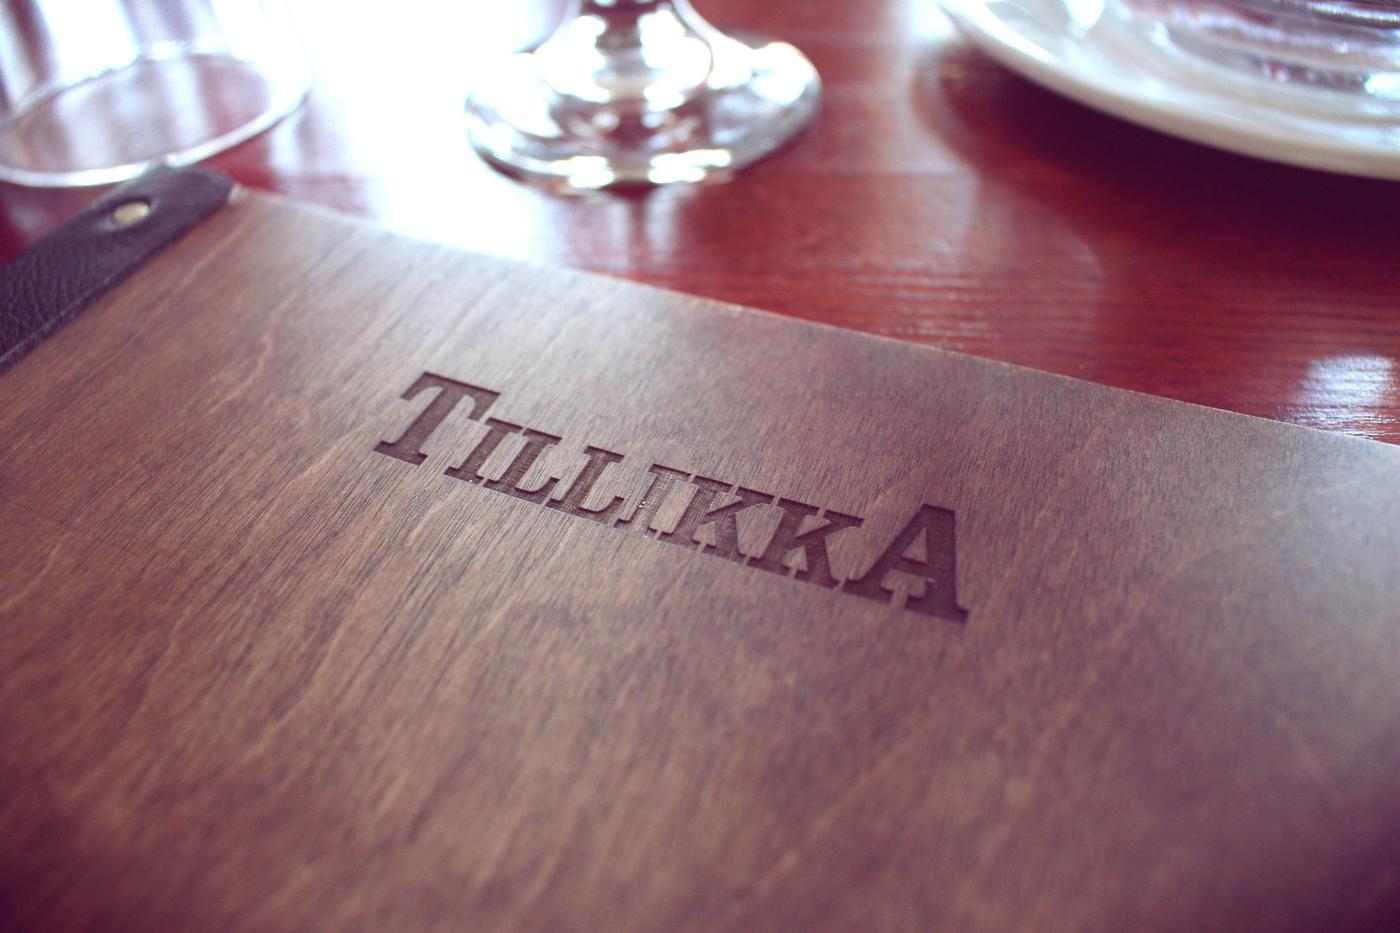 Legendaarisen Tillikan uusi menu